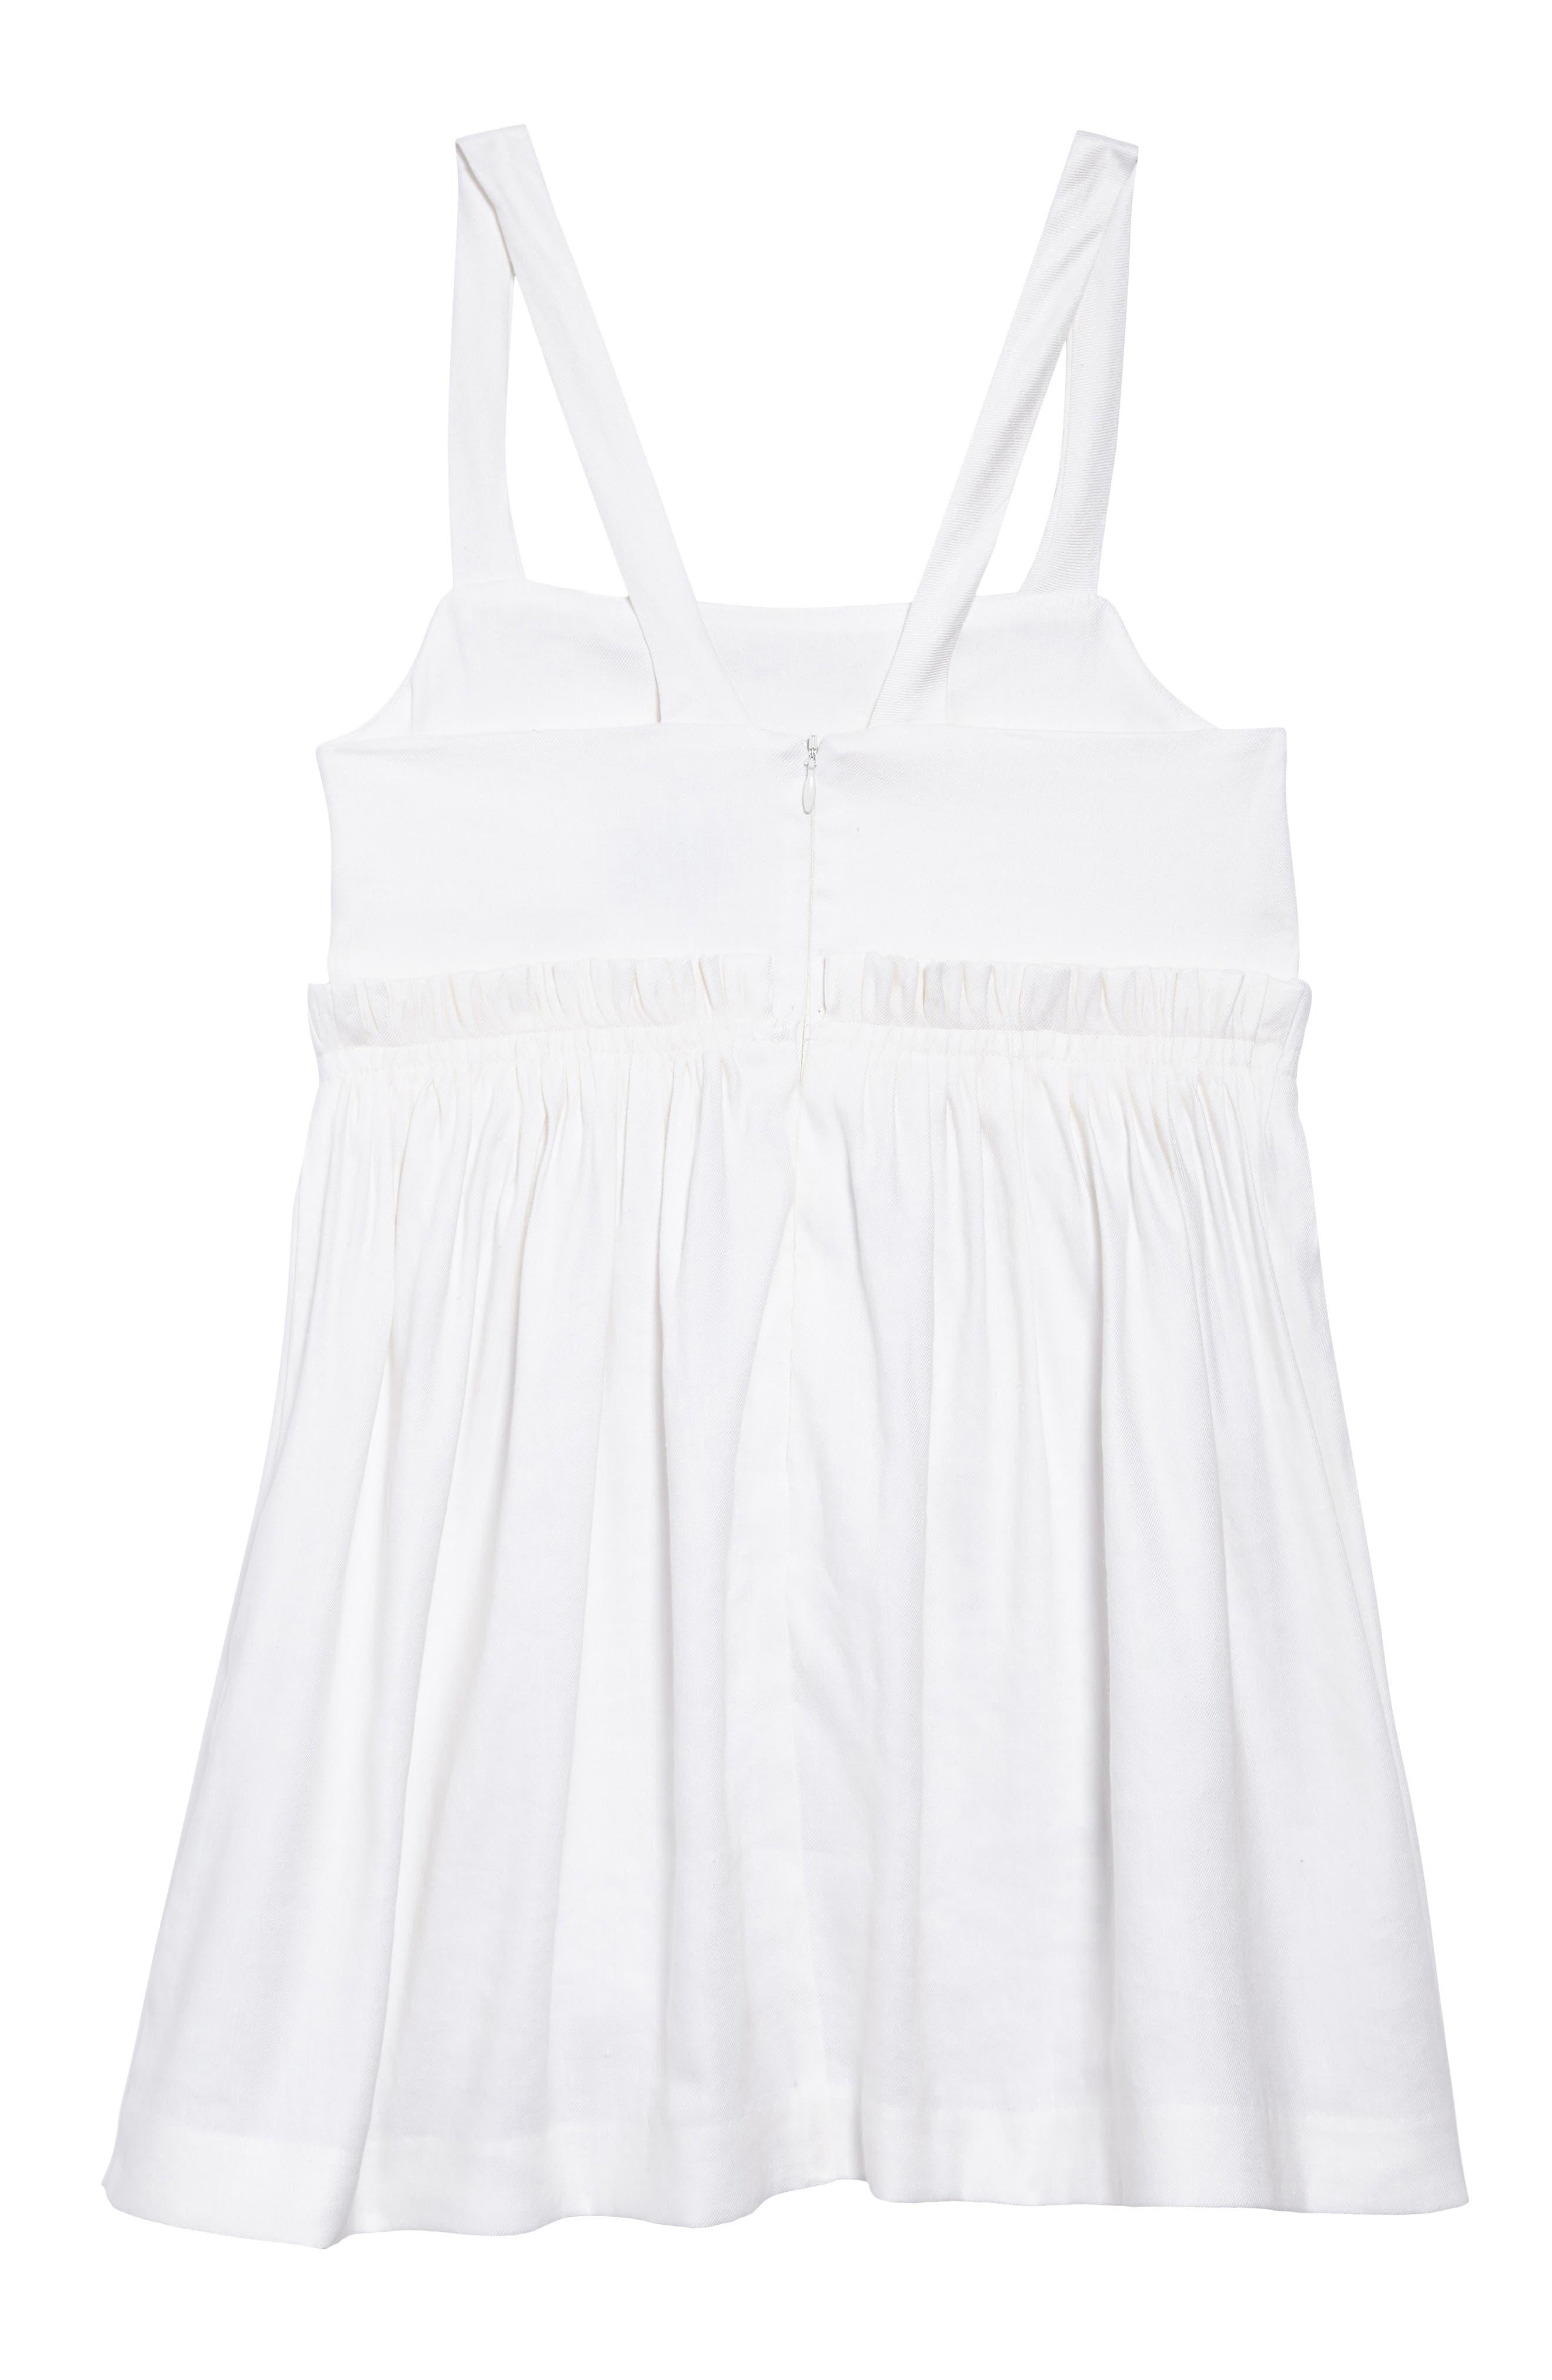 Jenny Linen Blend Dress,                             Alternate thumbnail 2, color,                             100